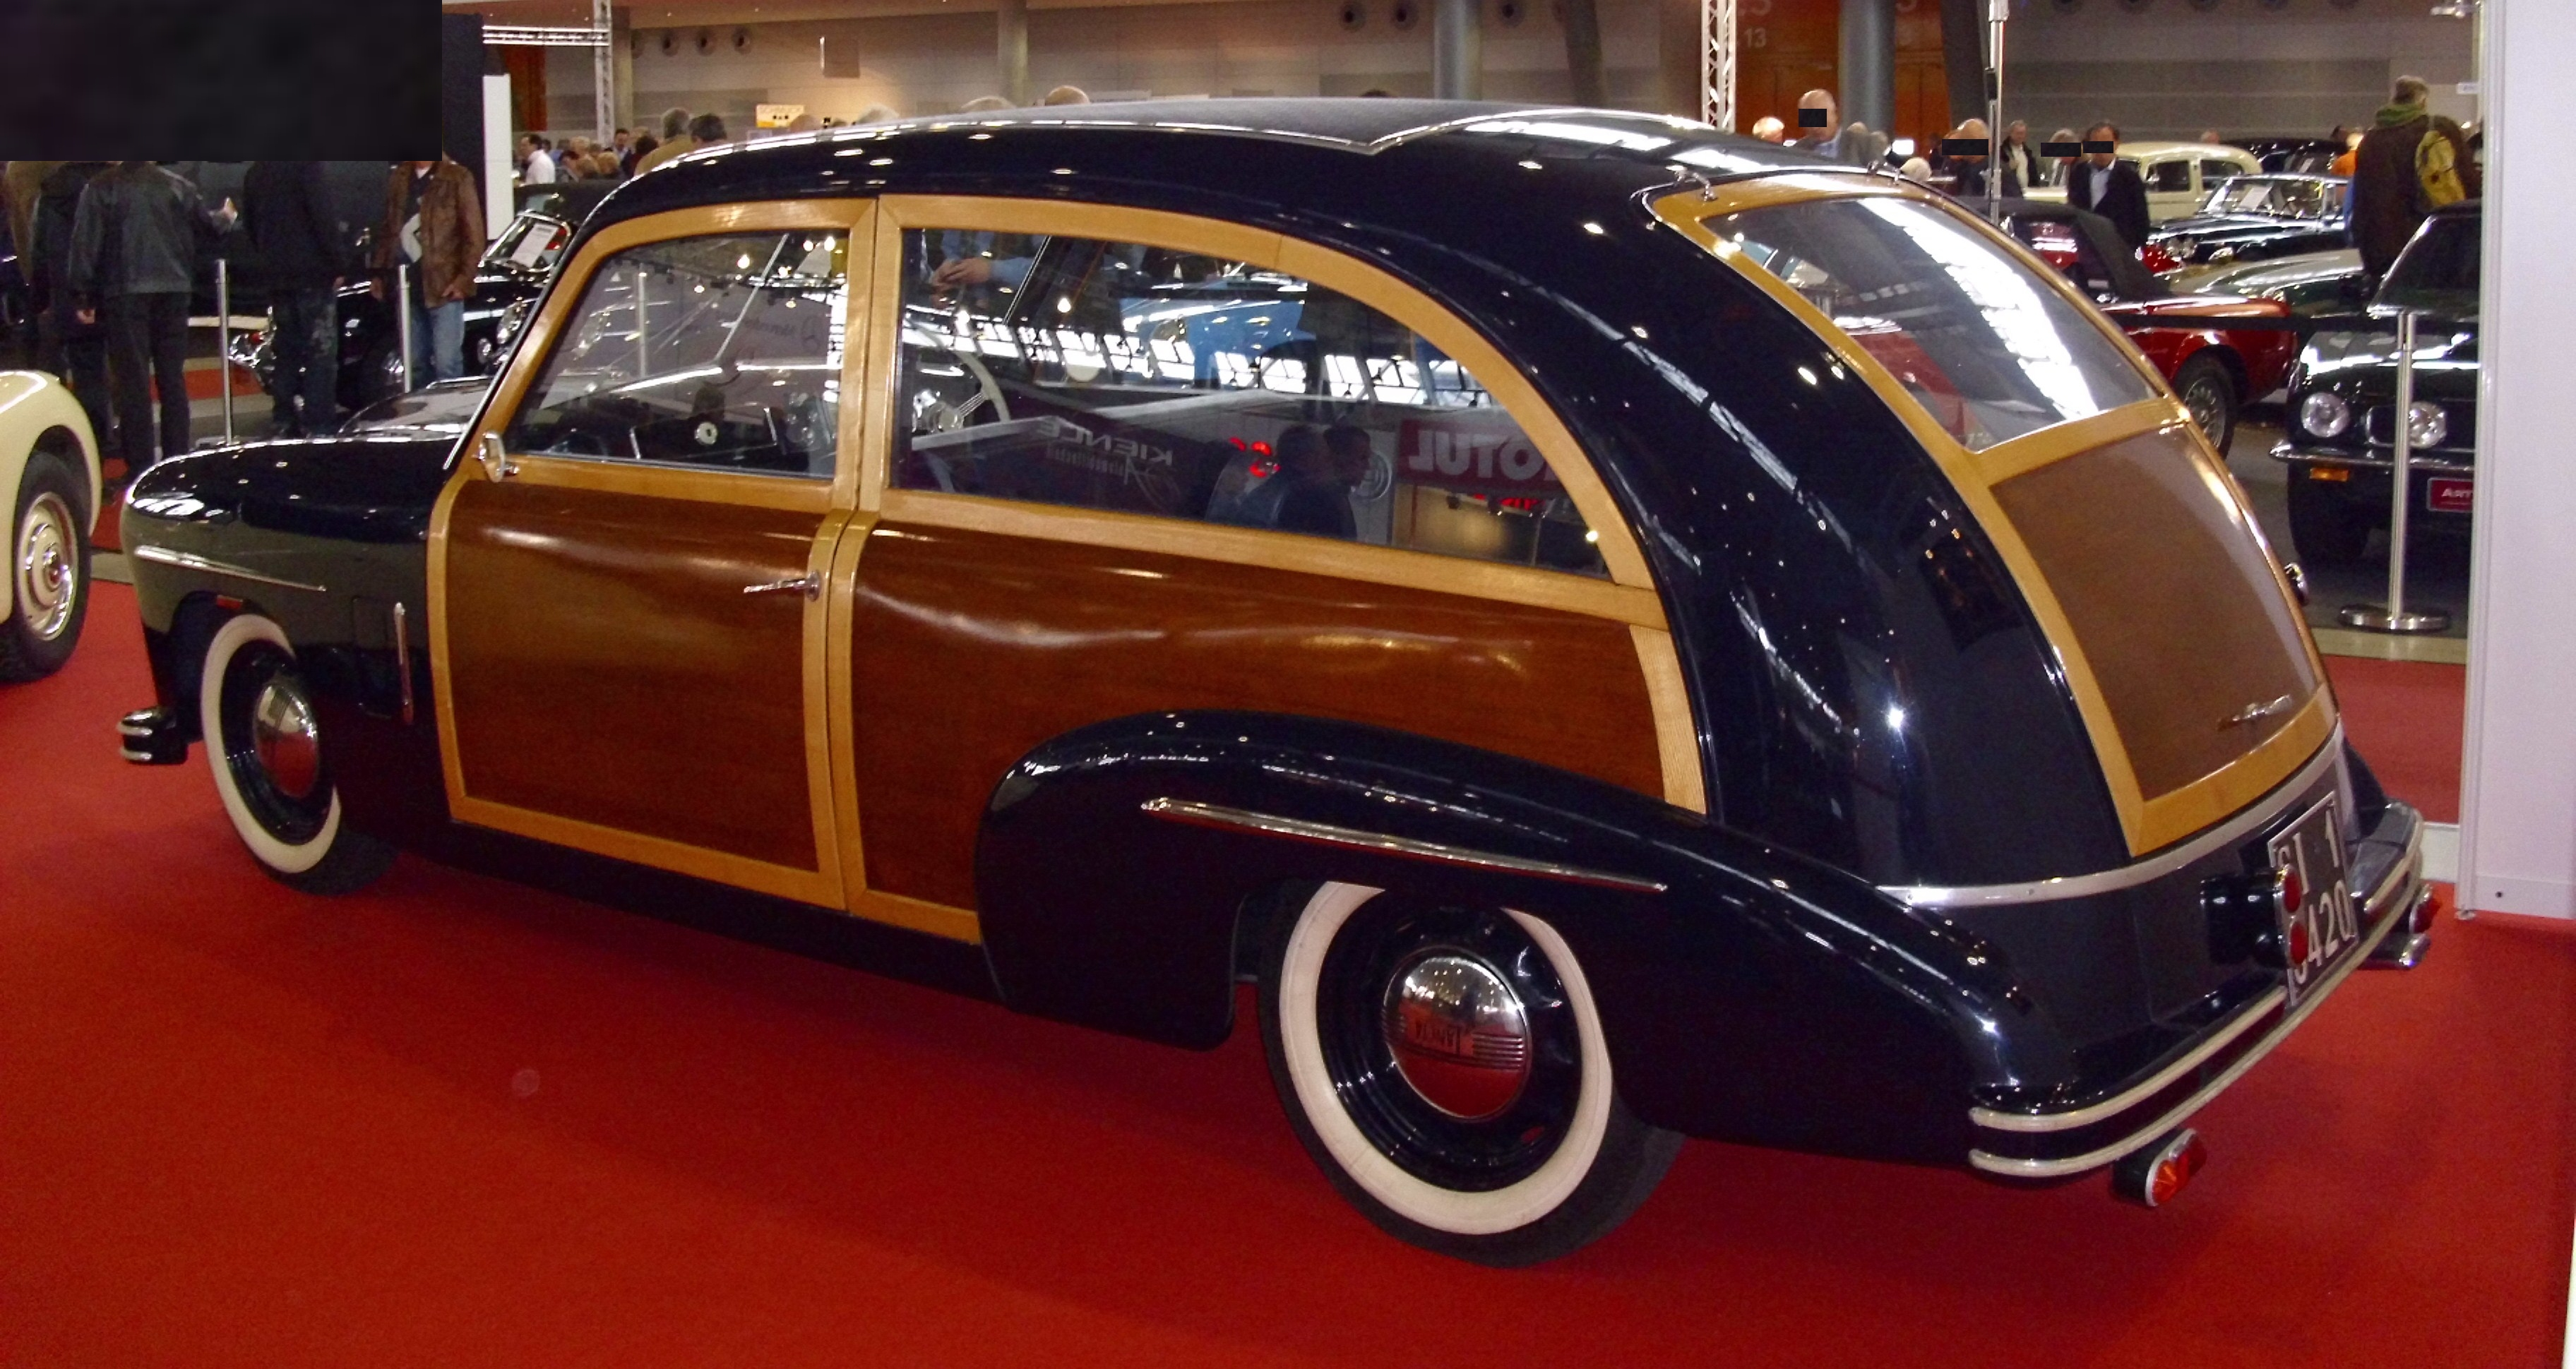 https://upload.wikimedia.org/wikipedia/commons/8/87/Lancia_Aprilia_Kombi_von_Lombardi_1948_vh.JPG